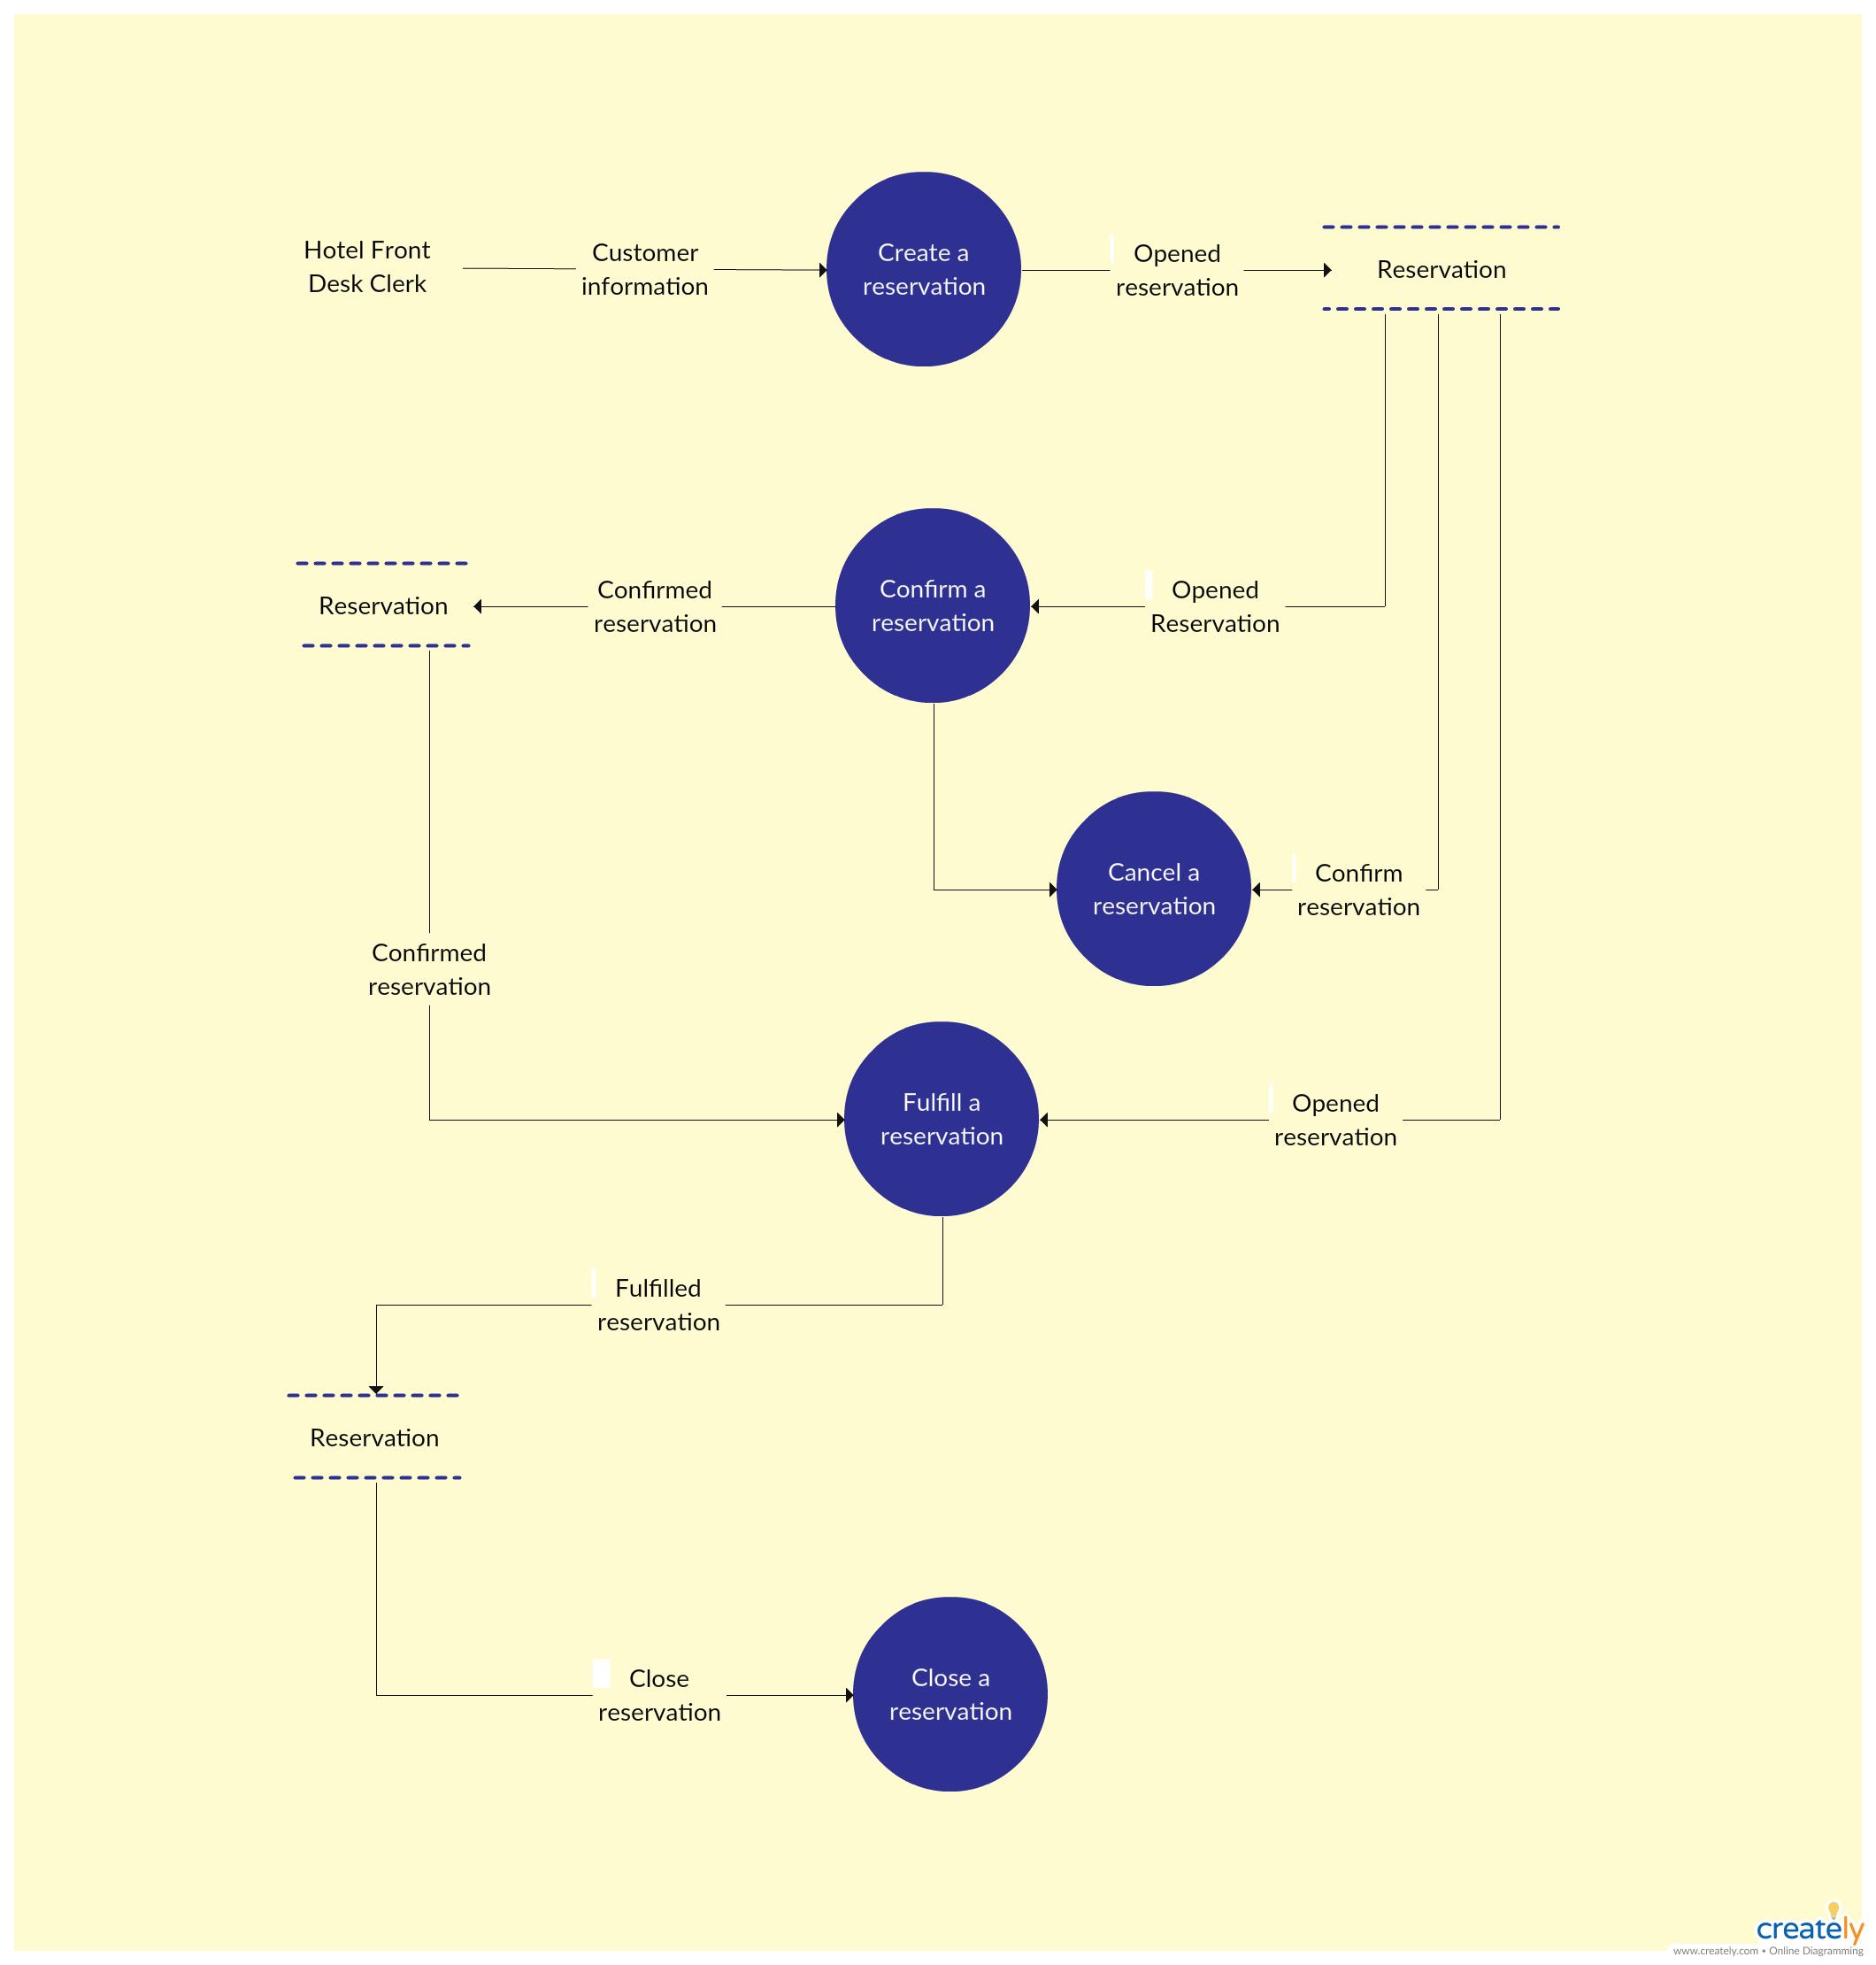 Level 1 Data Flow Diagram Template For Hotel Management